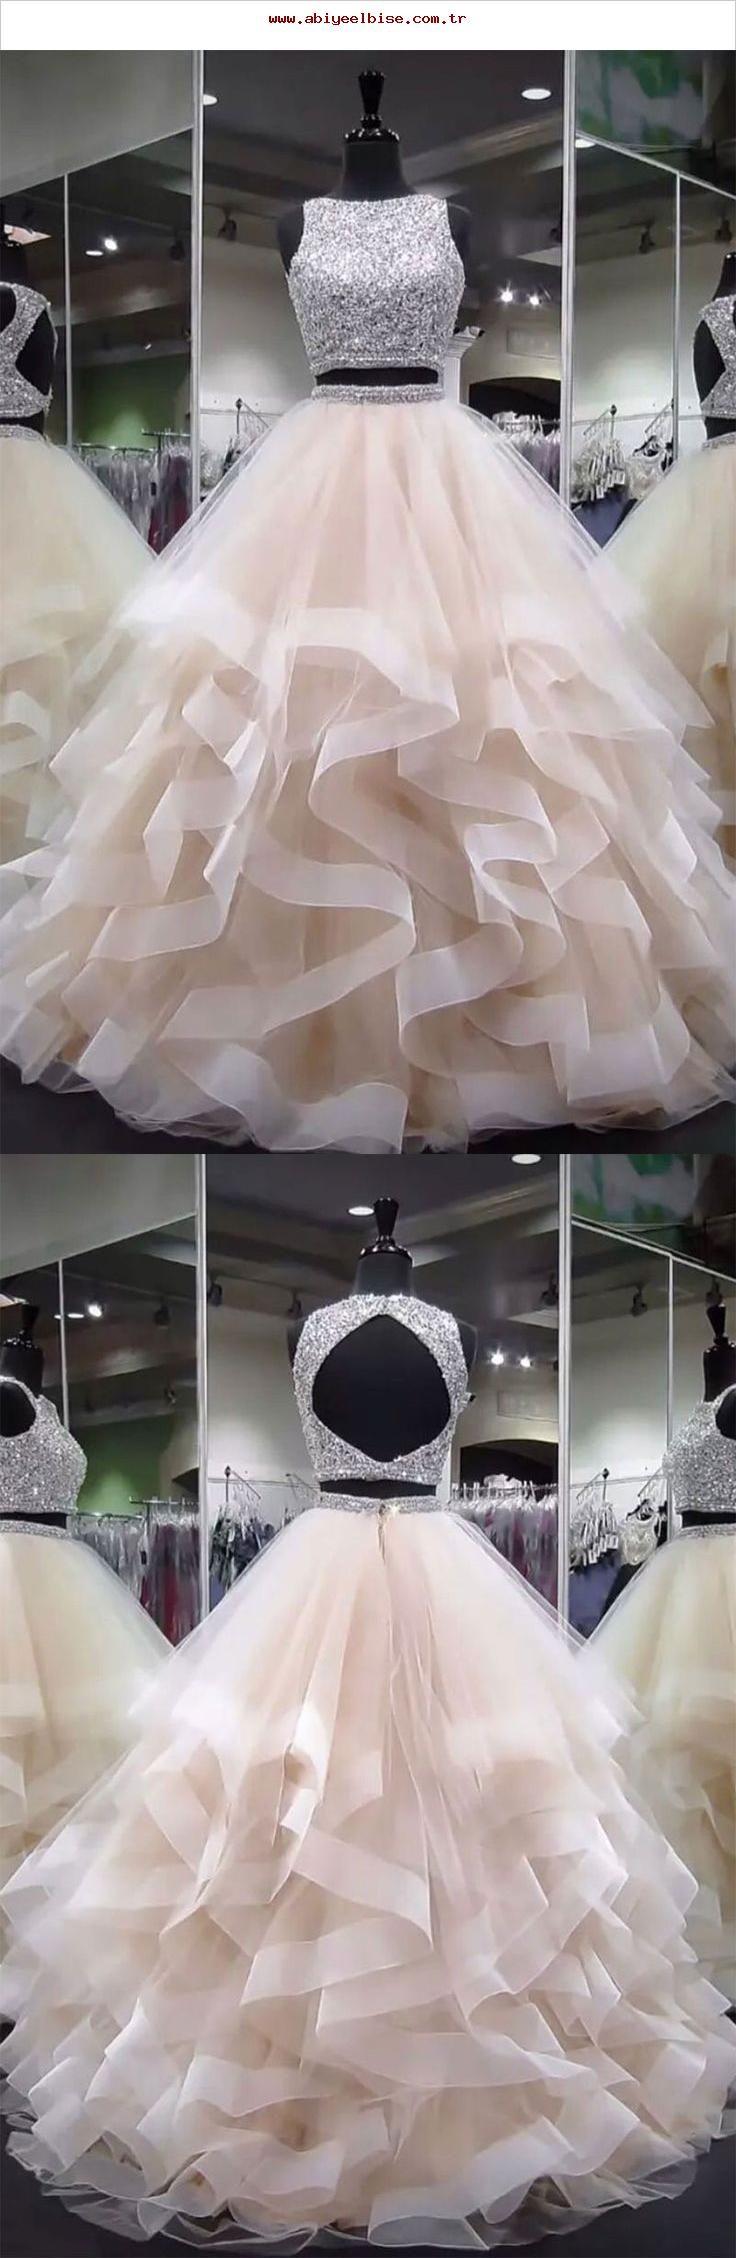 Licht Champagner Tüll Perlen Pailletten langes Abendkleid, Champagner Abendkleid,  #abendkleid #champagner #langes #licht #pailletten #perlen